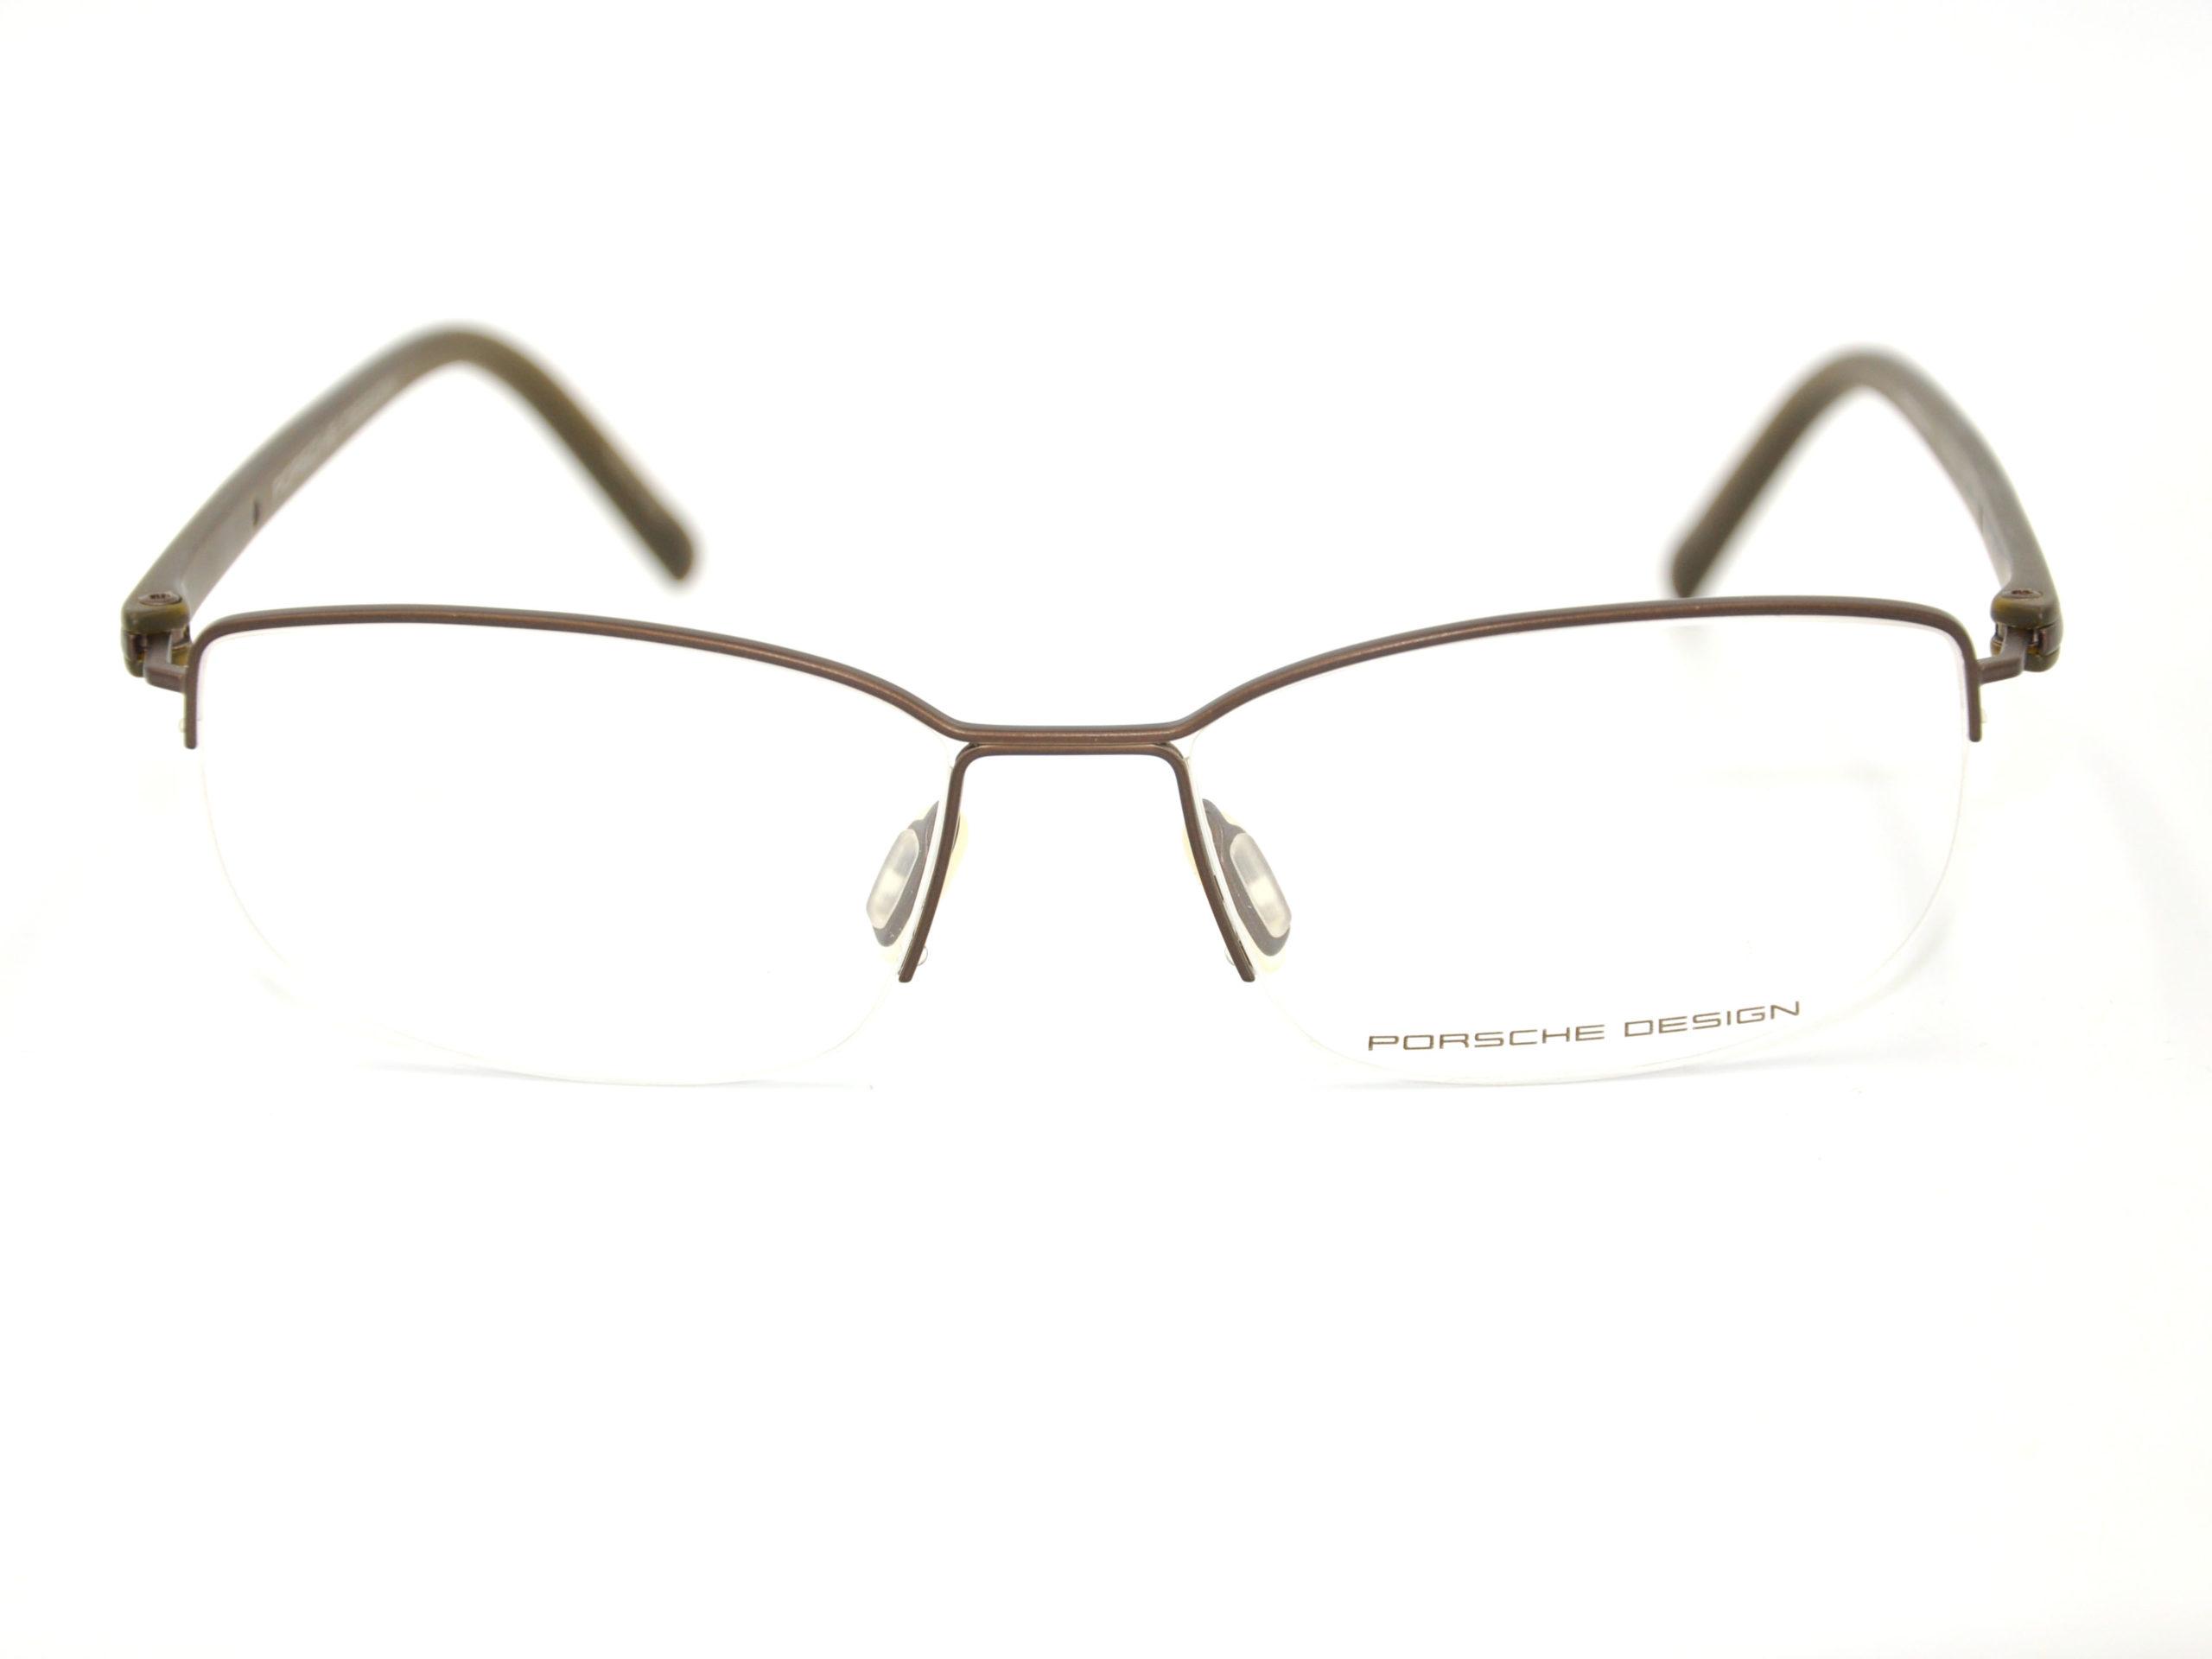 PORSCHE DESIGN P8244  D Prescription Glasses Piraeus